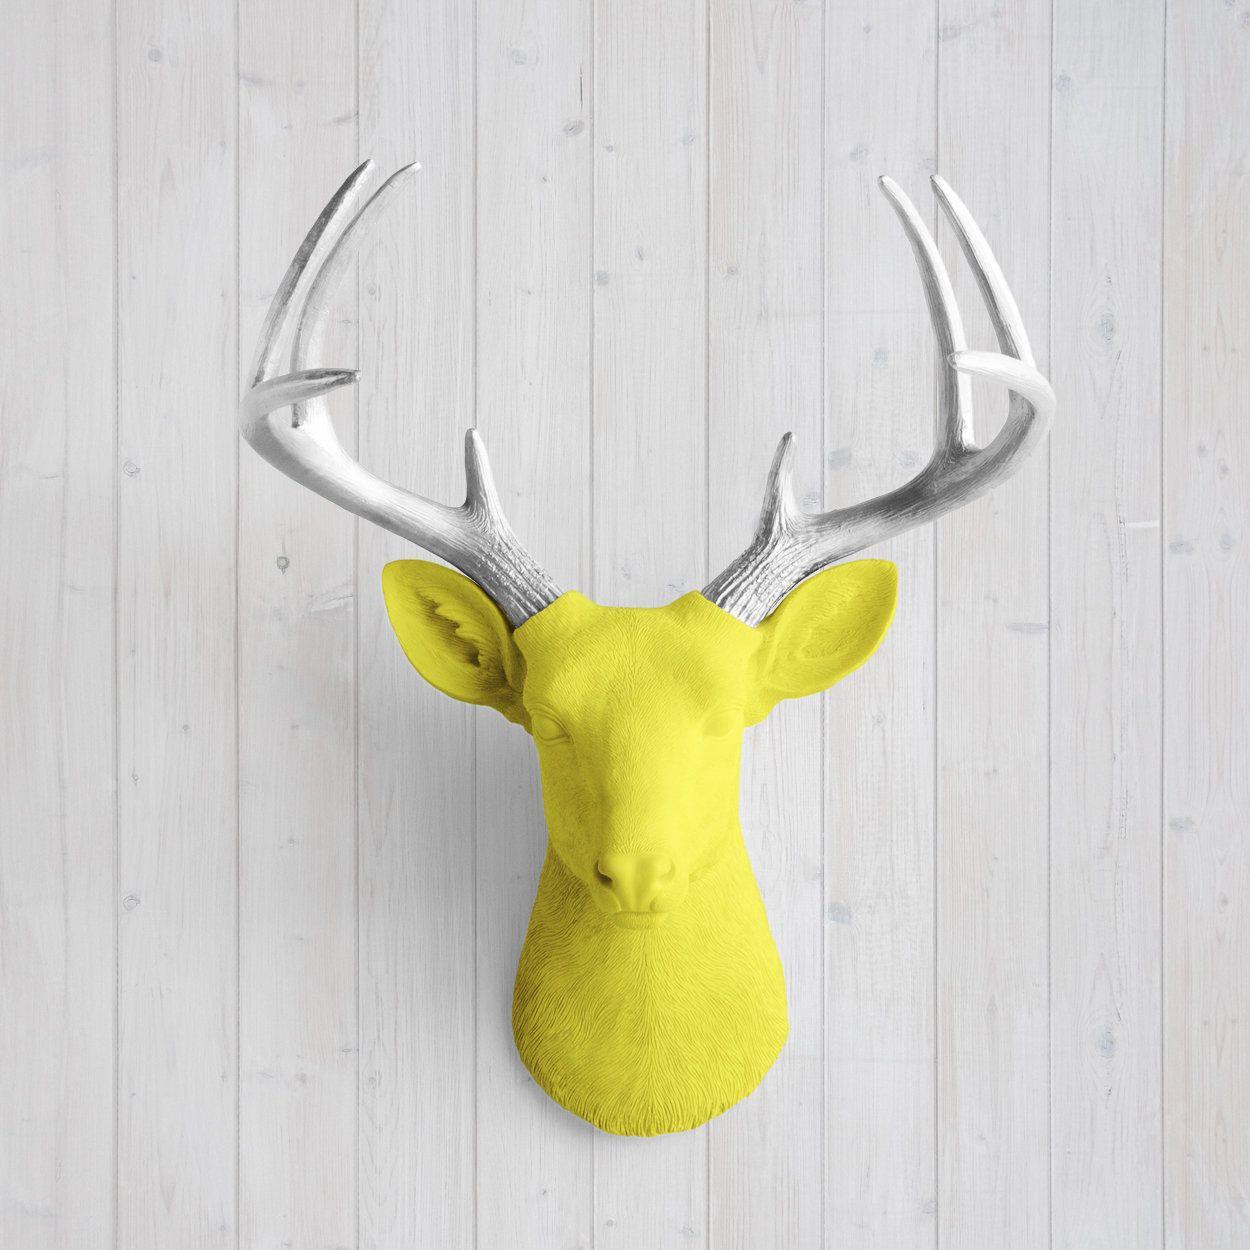 Virginia Faux Taxidermy Deer Head Wall Decor Deer Head Wall Decor Deer Heads Wall